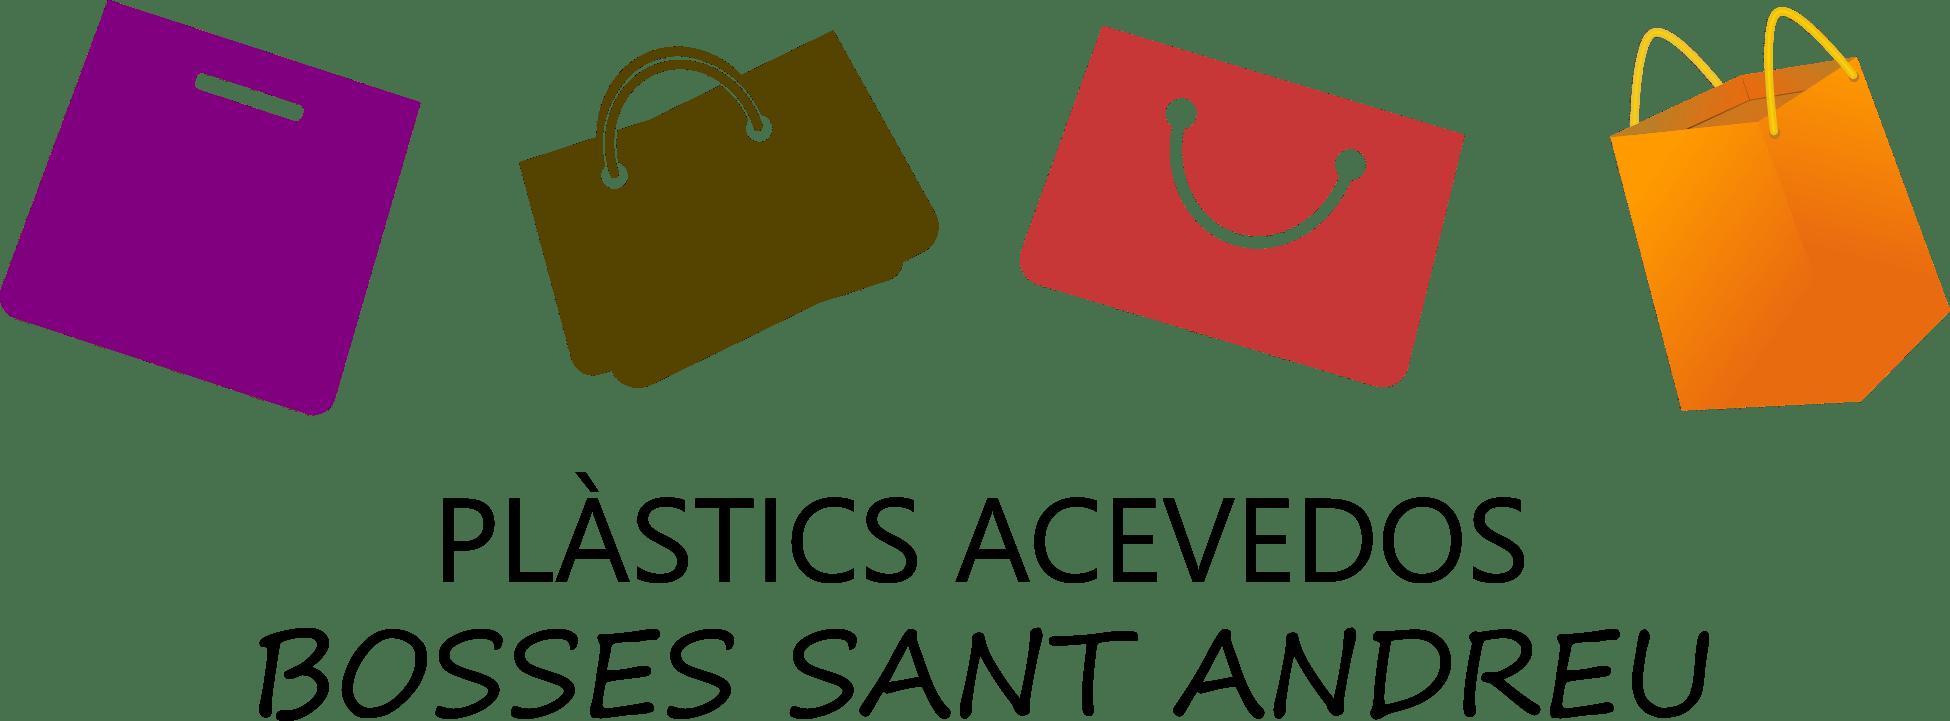 Plastics Acevedos